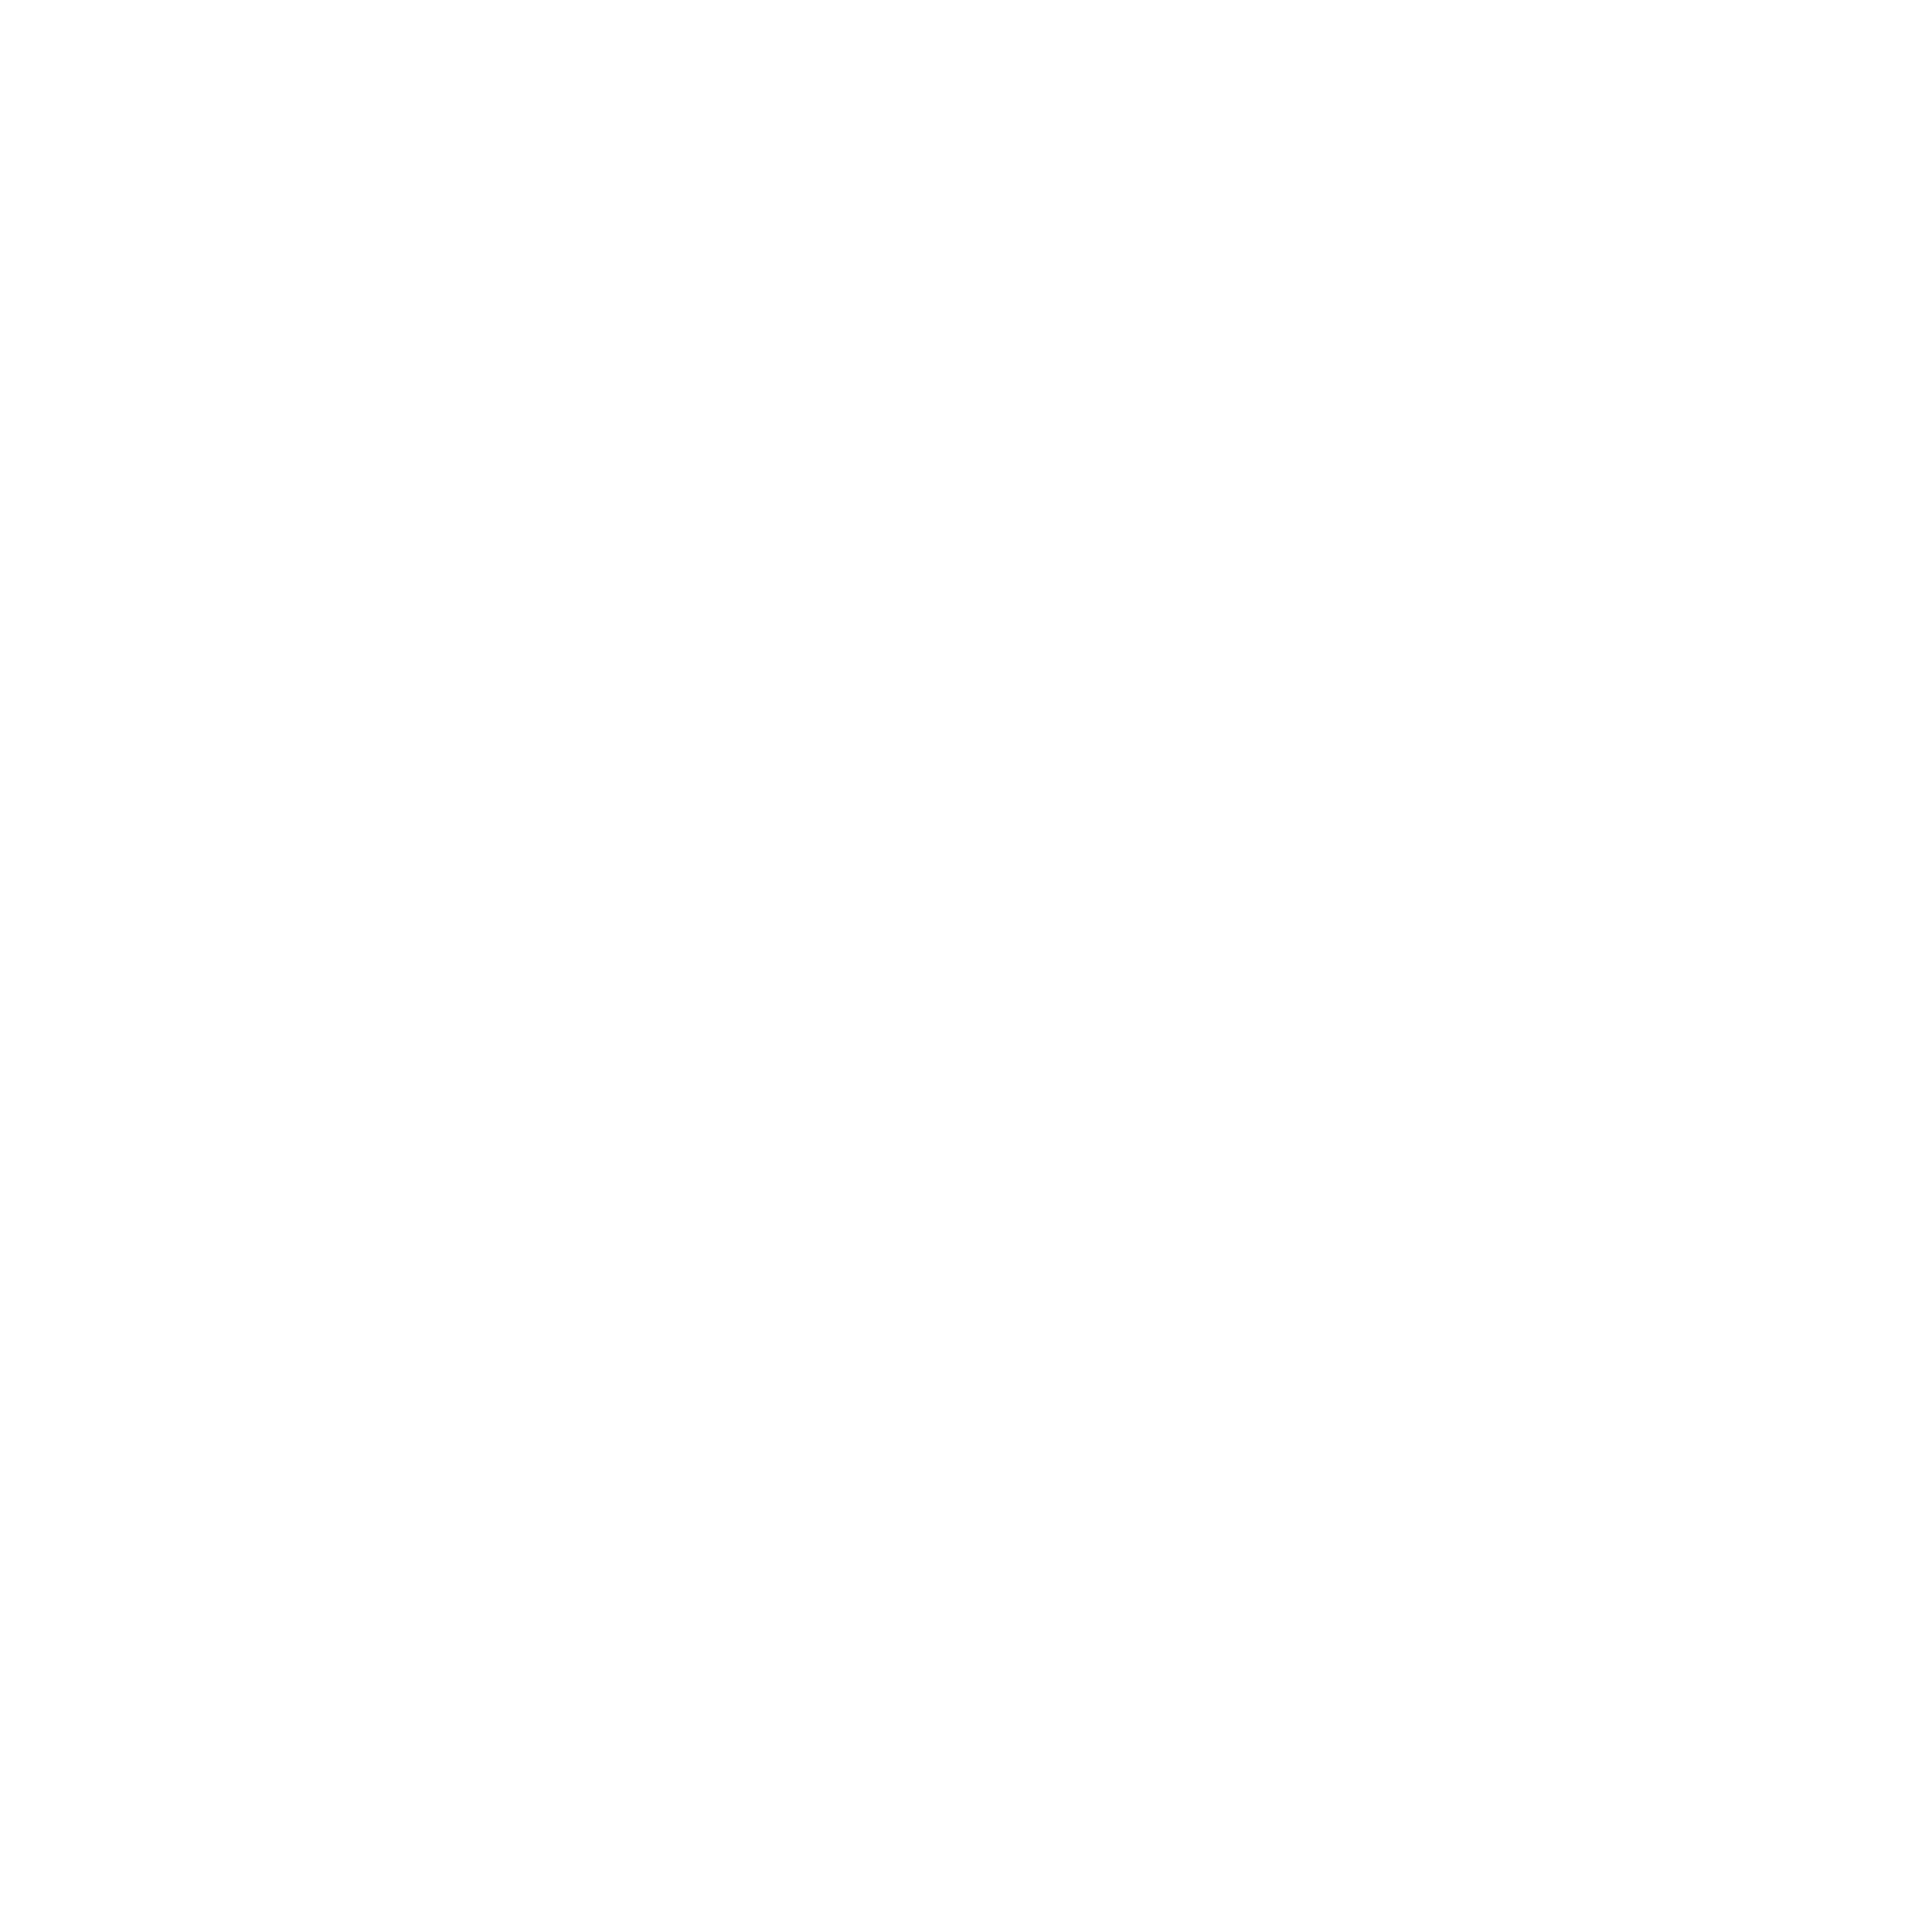 Let's Go!, Just Breathe! & Let's Get it Started! T-Shirt designs.